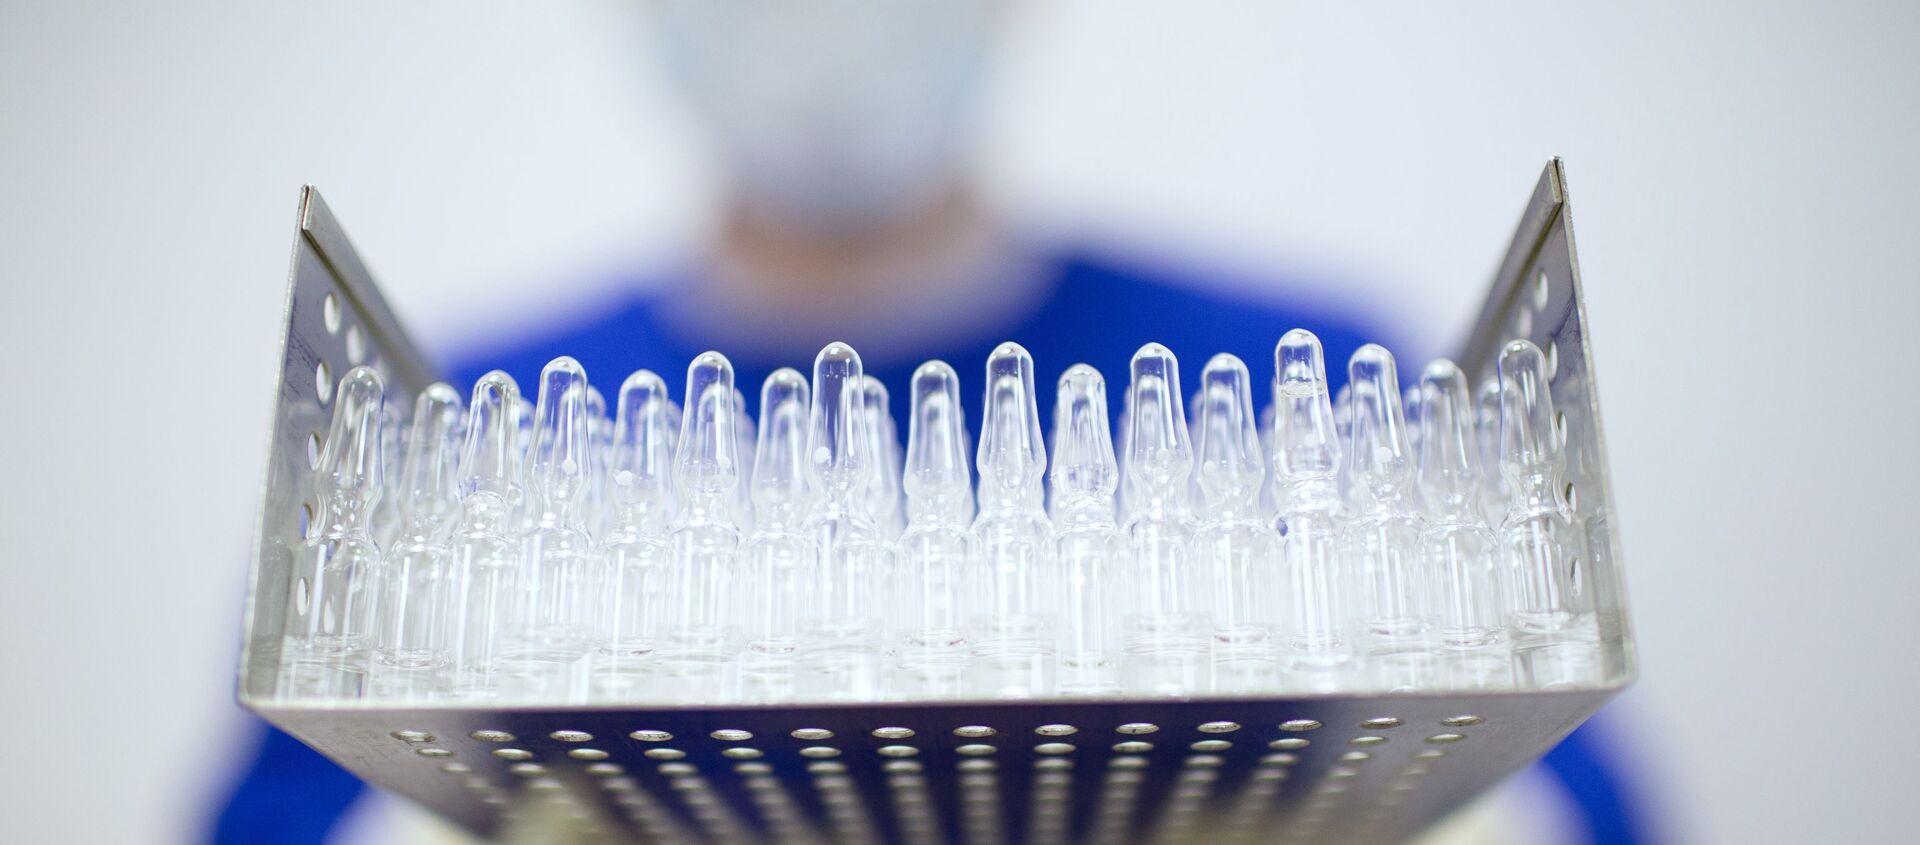 Производство вакцины от COVID-19 на фармацевтическом заводе Биннофарм - Sputnik Латвия, 1920, 14.03.2021